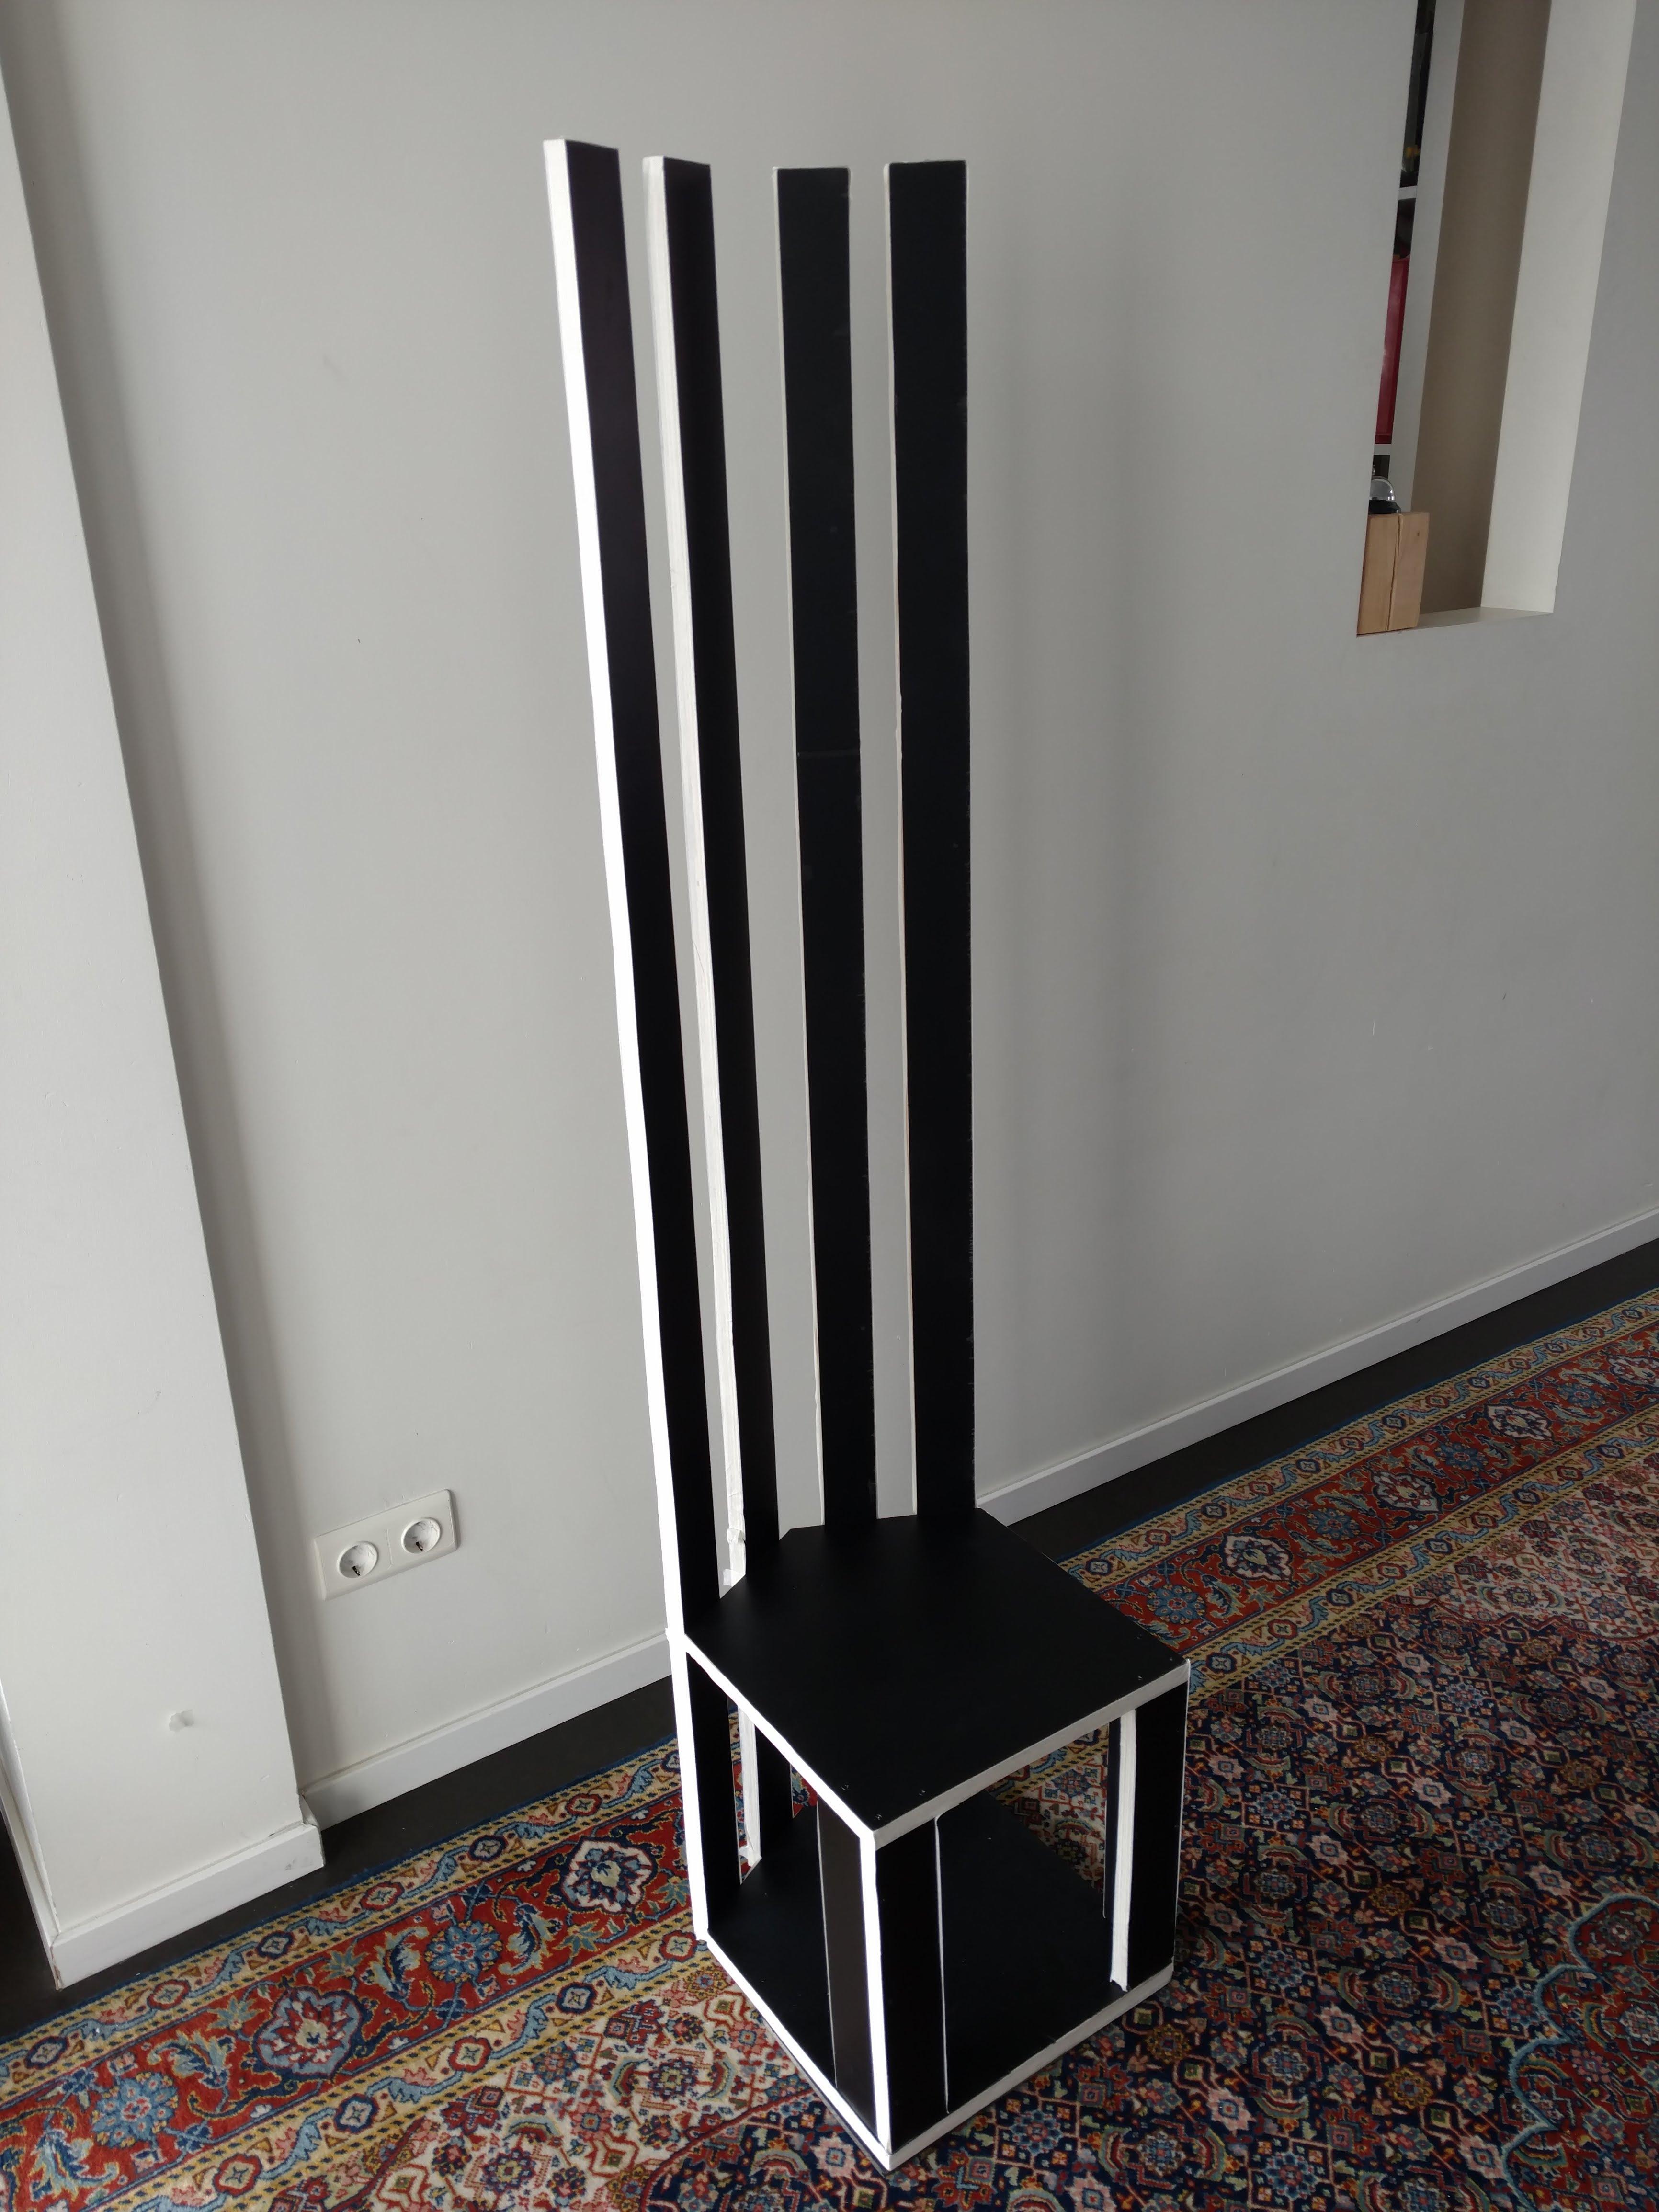 Mackintosh - inspired chair